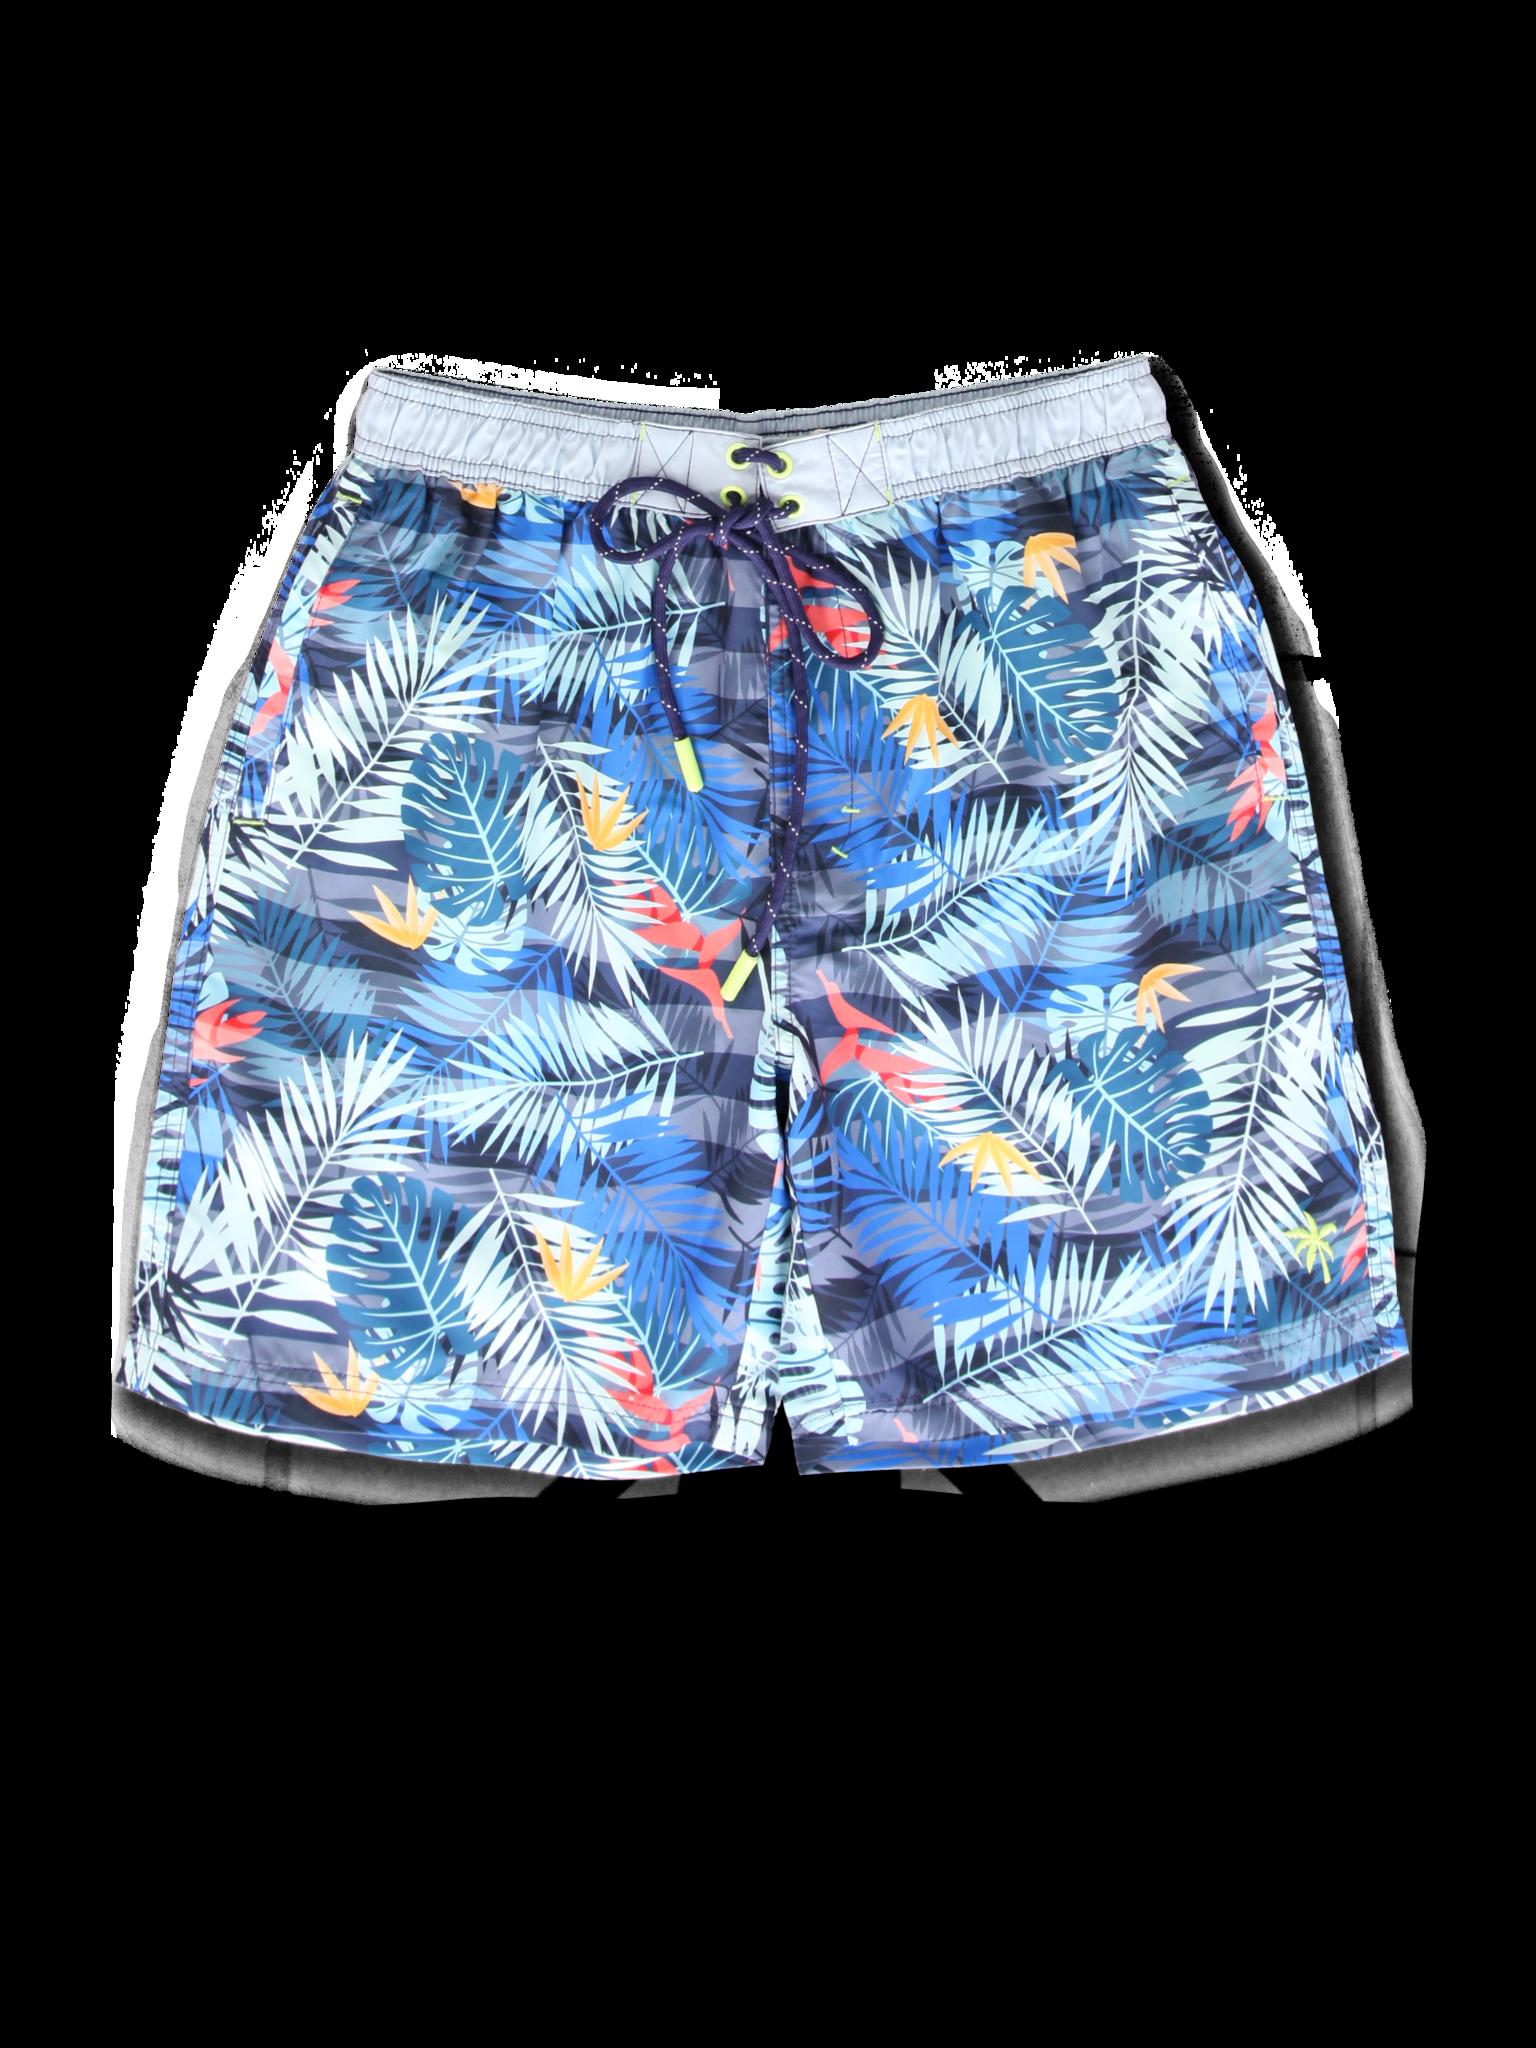 All Brands | Summerproducts Men | Swimwear | 18 pcs/box